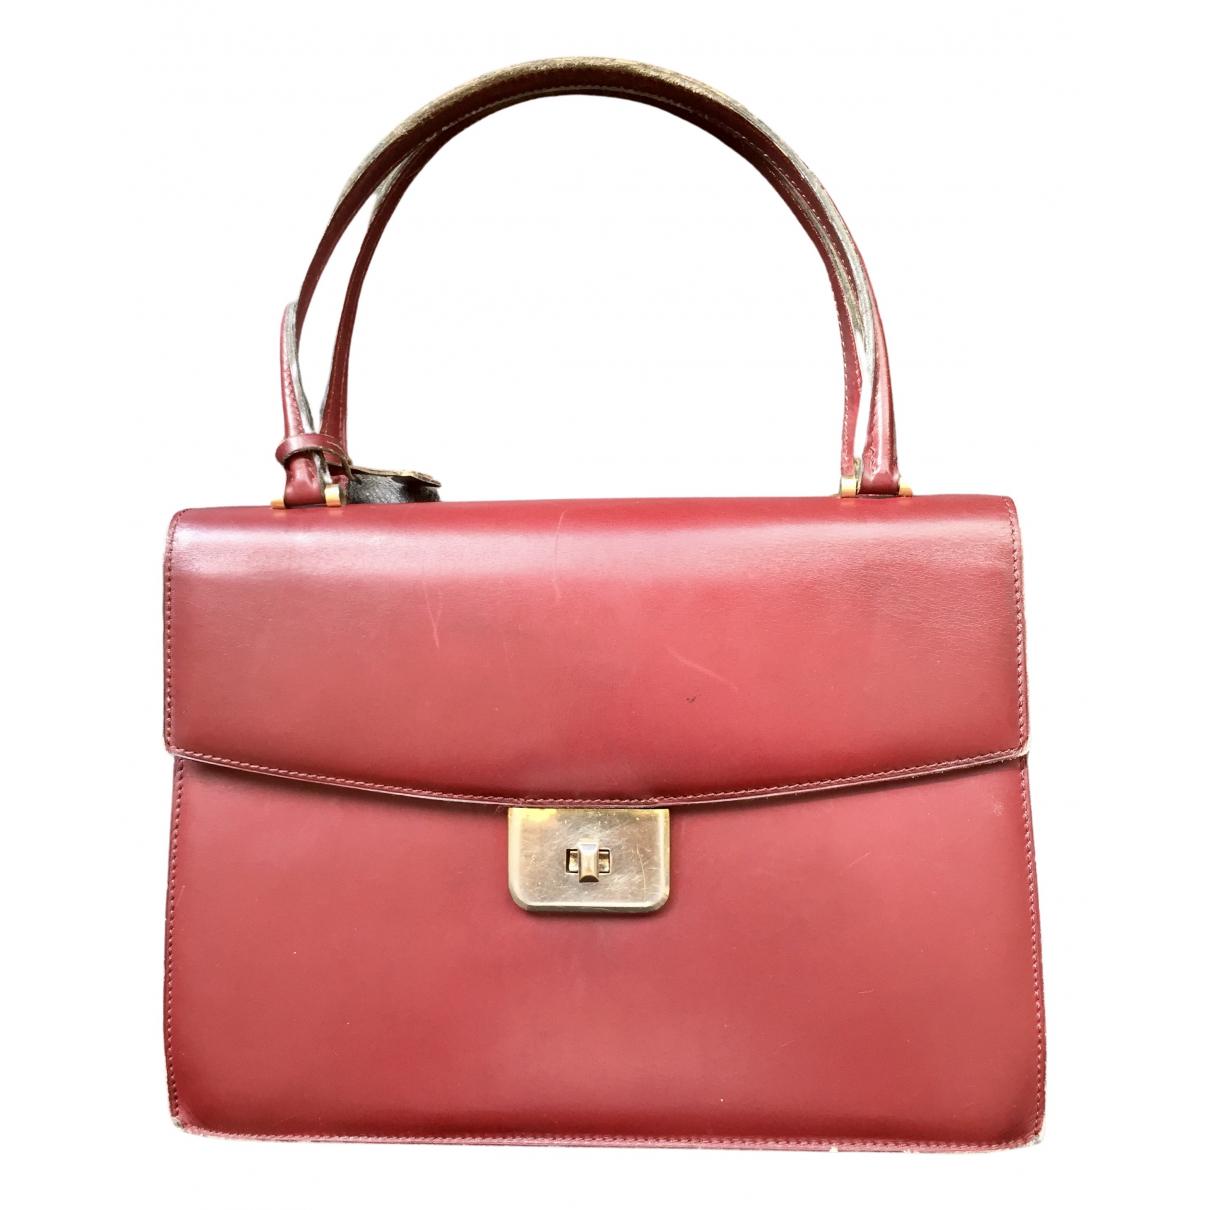 Delvaux N Burgundy Leather handbag for Women N